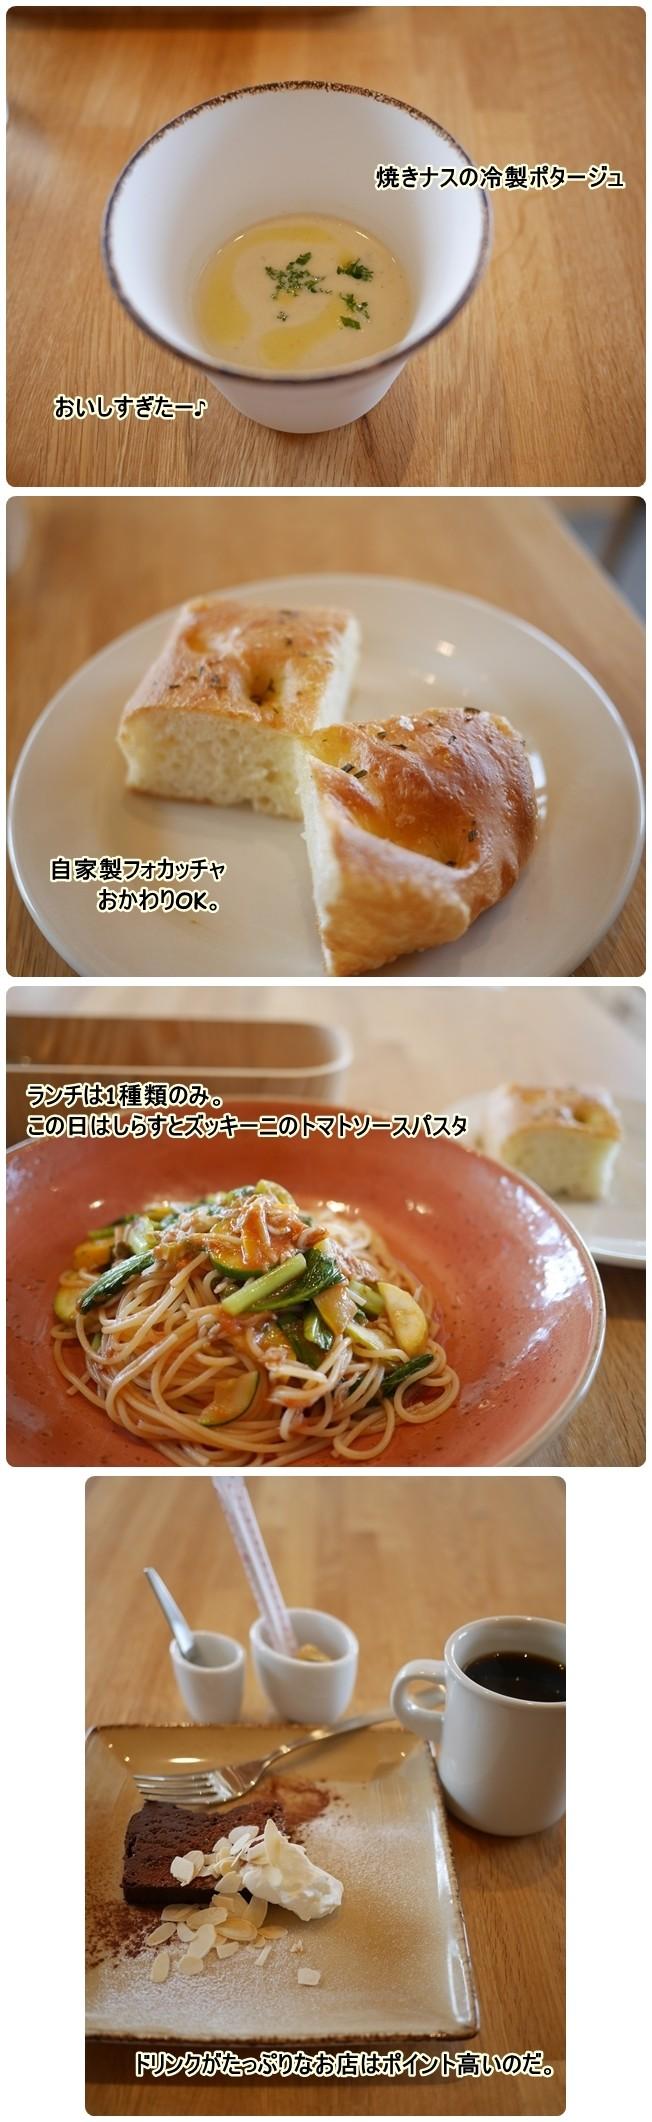 ■P1200635-vert